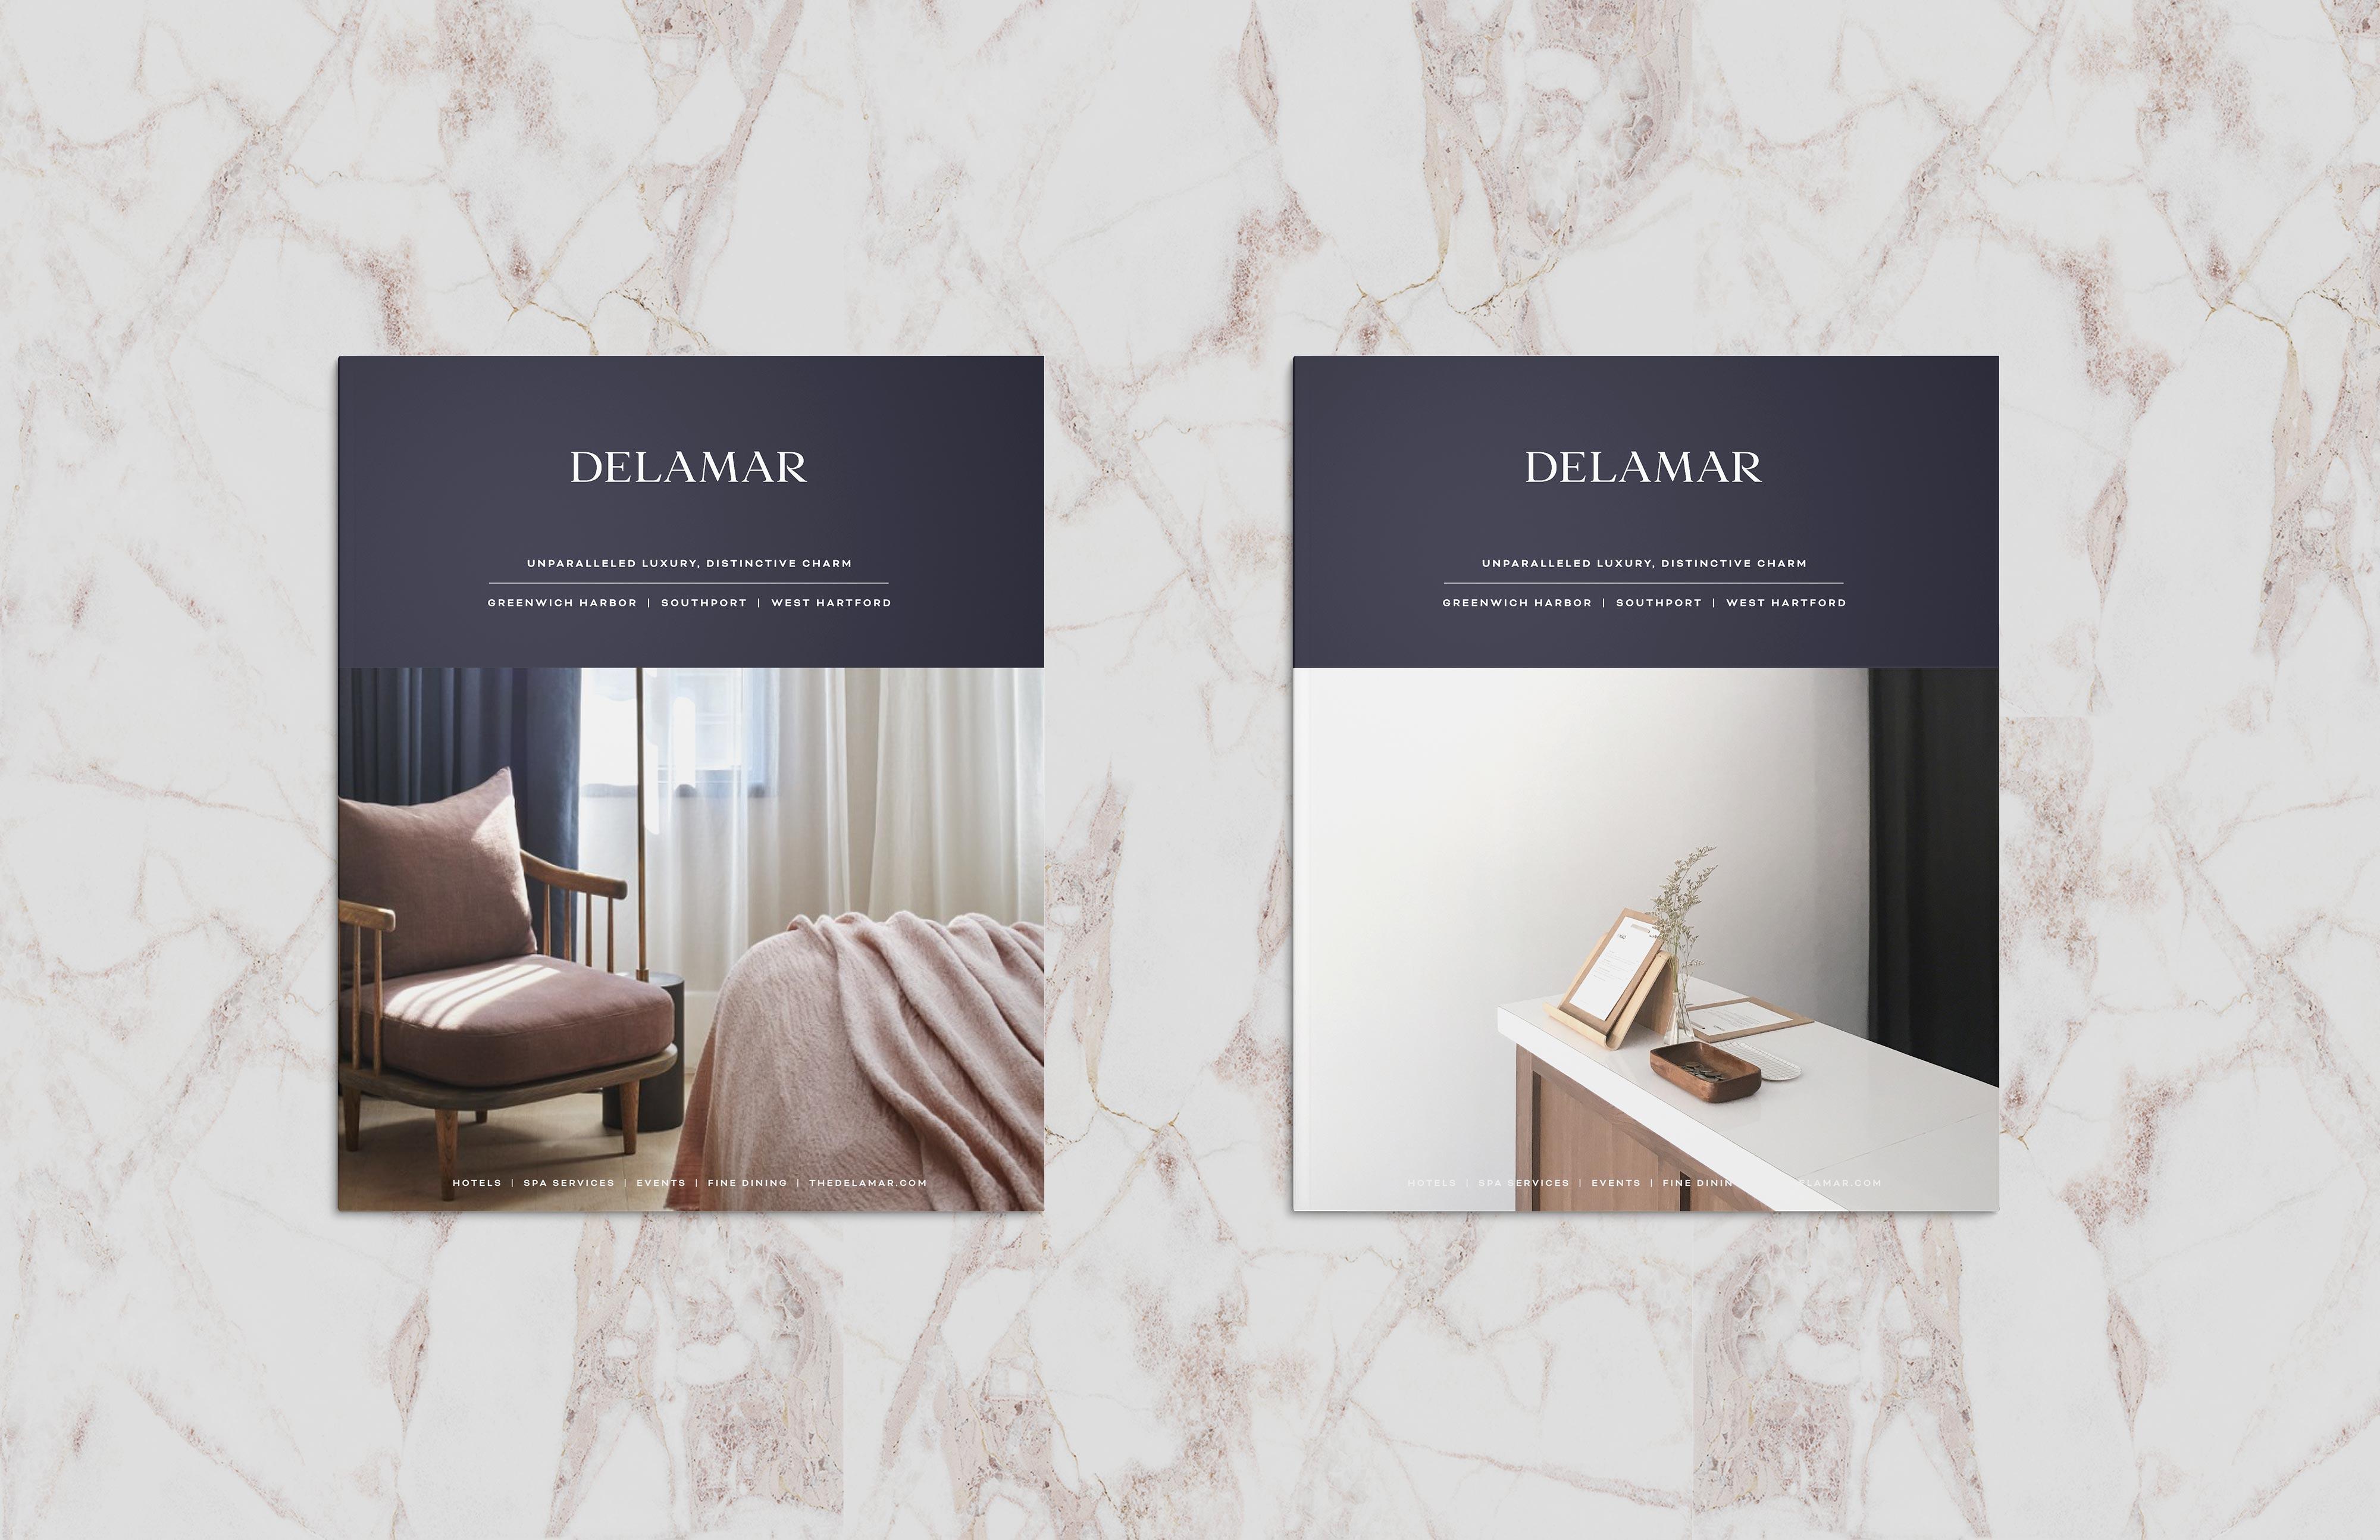 01-Delamar-books L